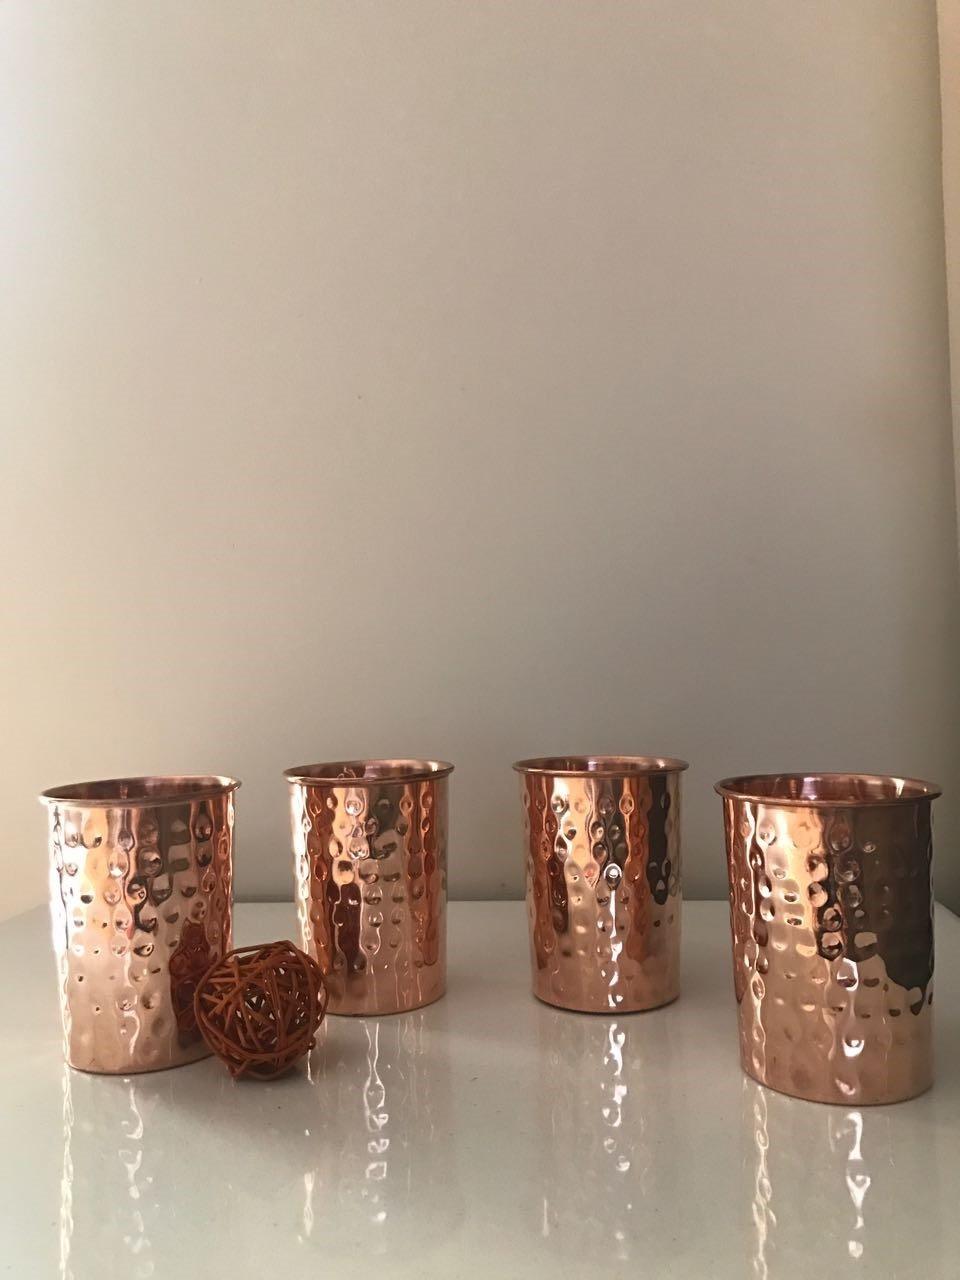 Zap Impex /®/ /Vasos de Cristal de Cobre amartillado 100/% Cobre Puro zuhaltung ayurvedischen curativas